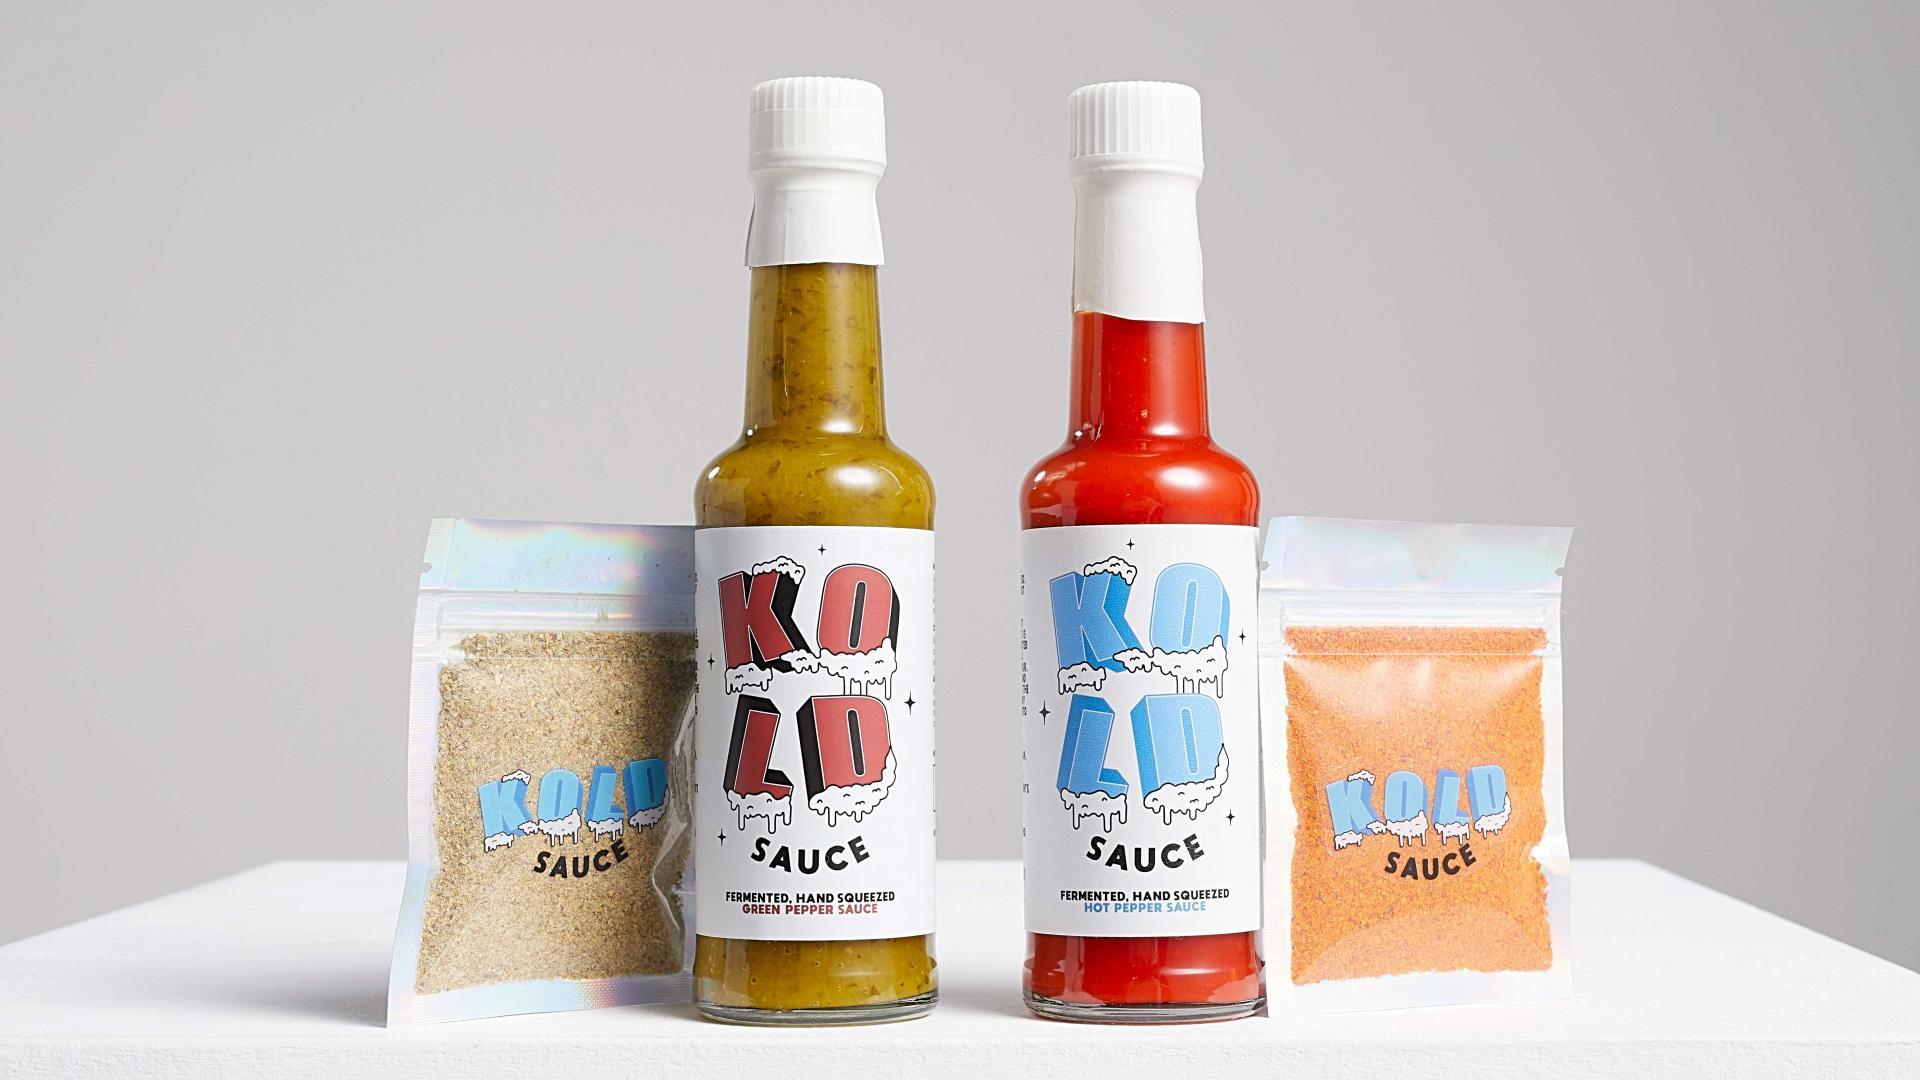 Food and drink Christmas gifts: Kold Hot Sauce